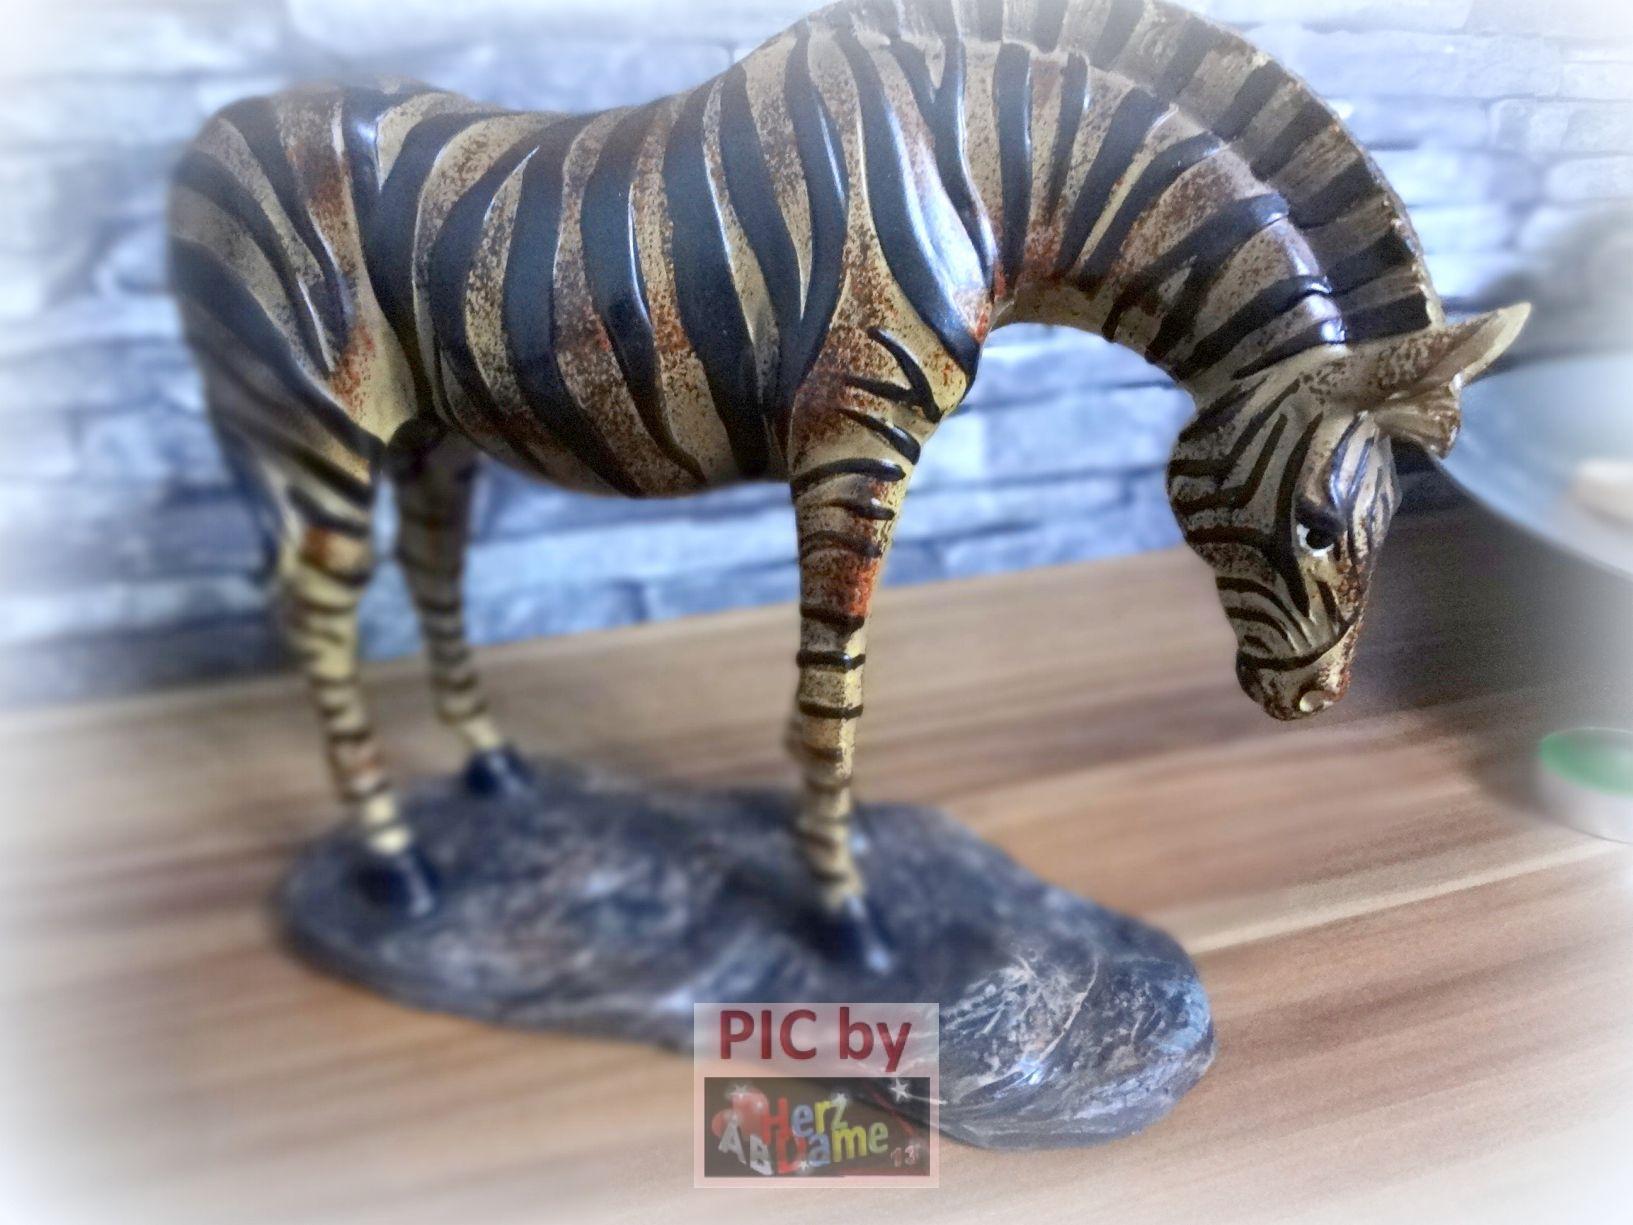 ab49820 xl deko tier skulptur grosses zebra afrika. Black Bedroom Furniture Sets. Home Design Ideas